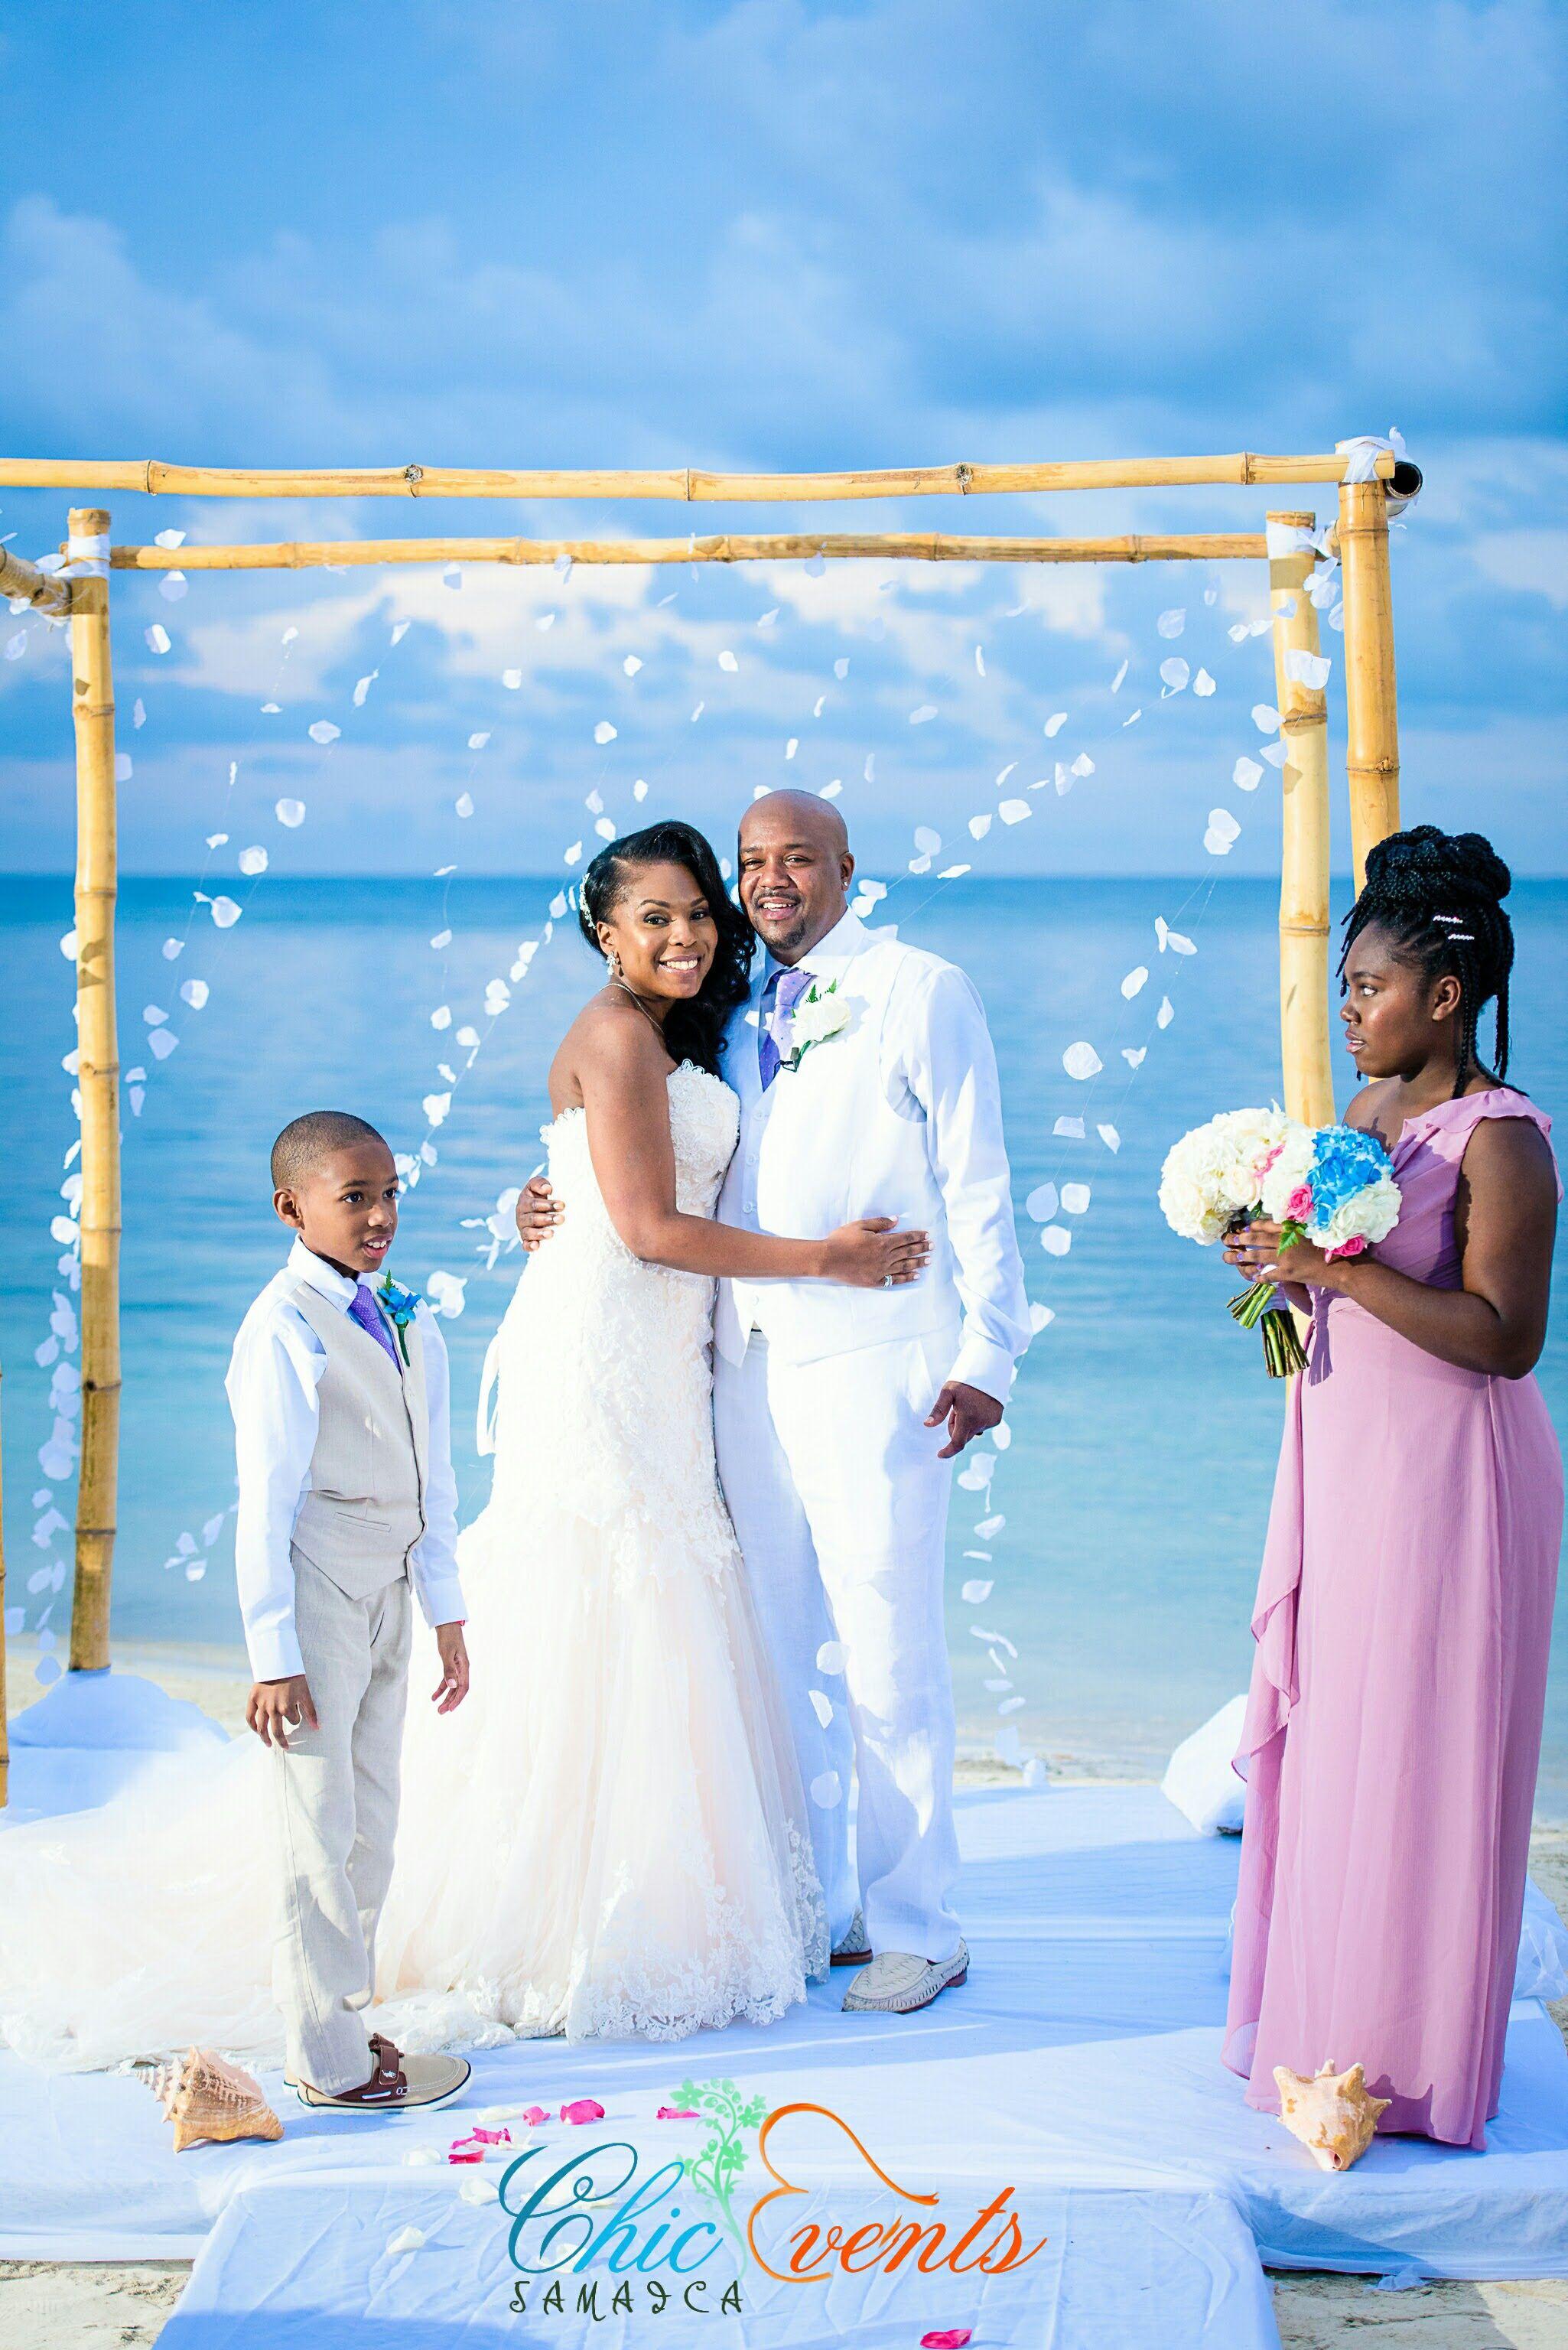 wedding planners in jamaica Wedding Decor Ideas